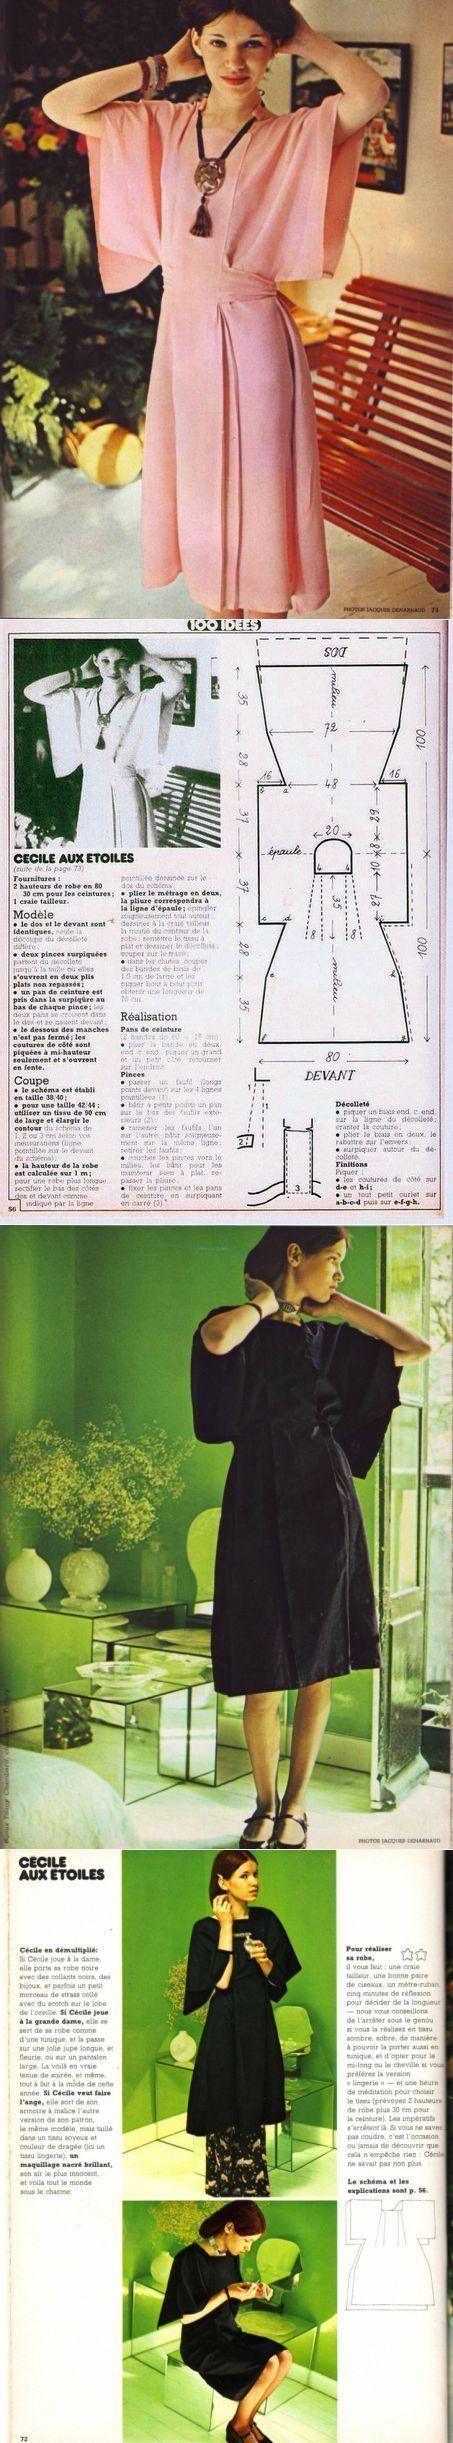 Schnittmuster Kleid #diyclothes